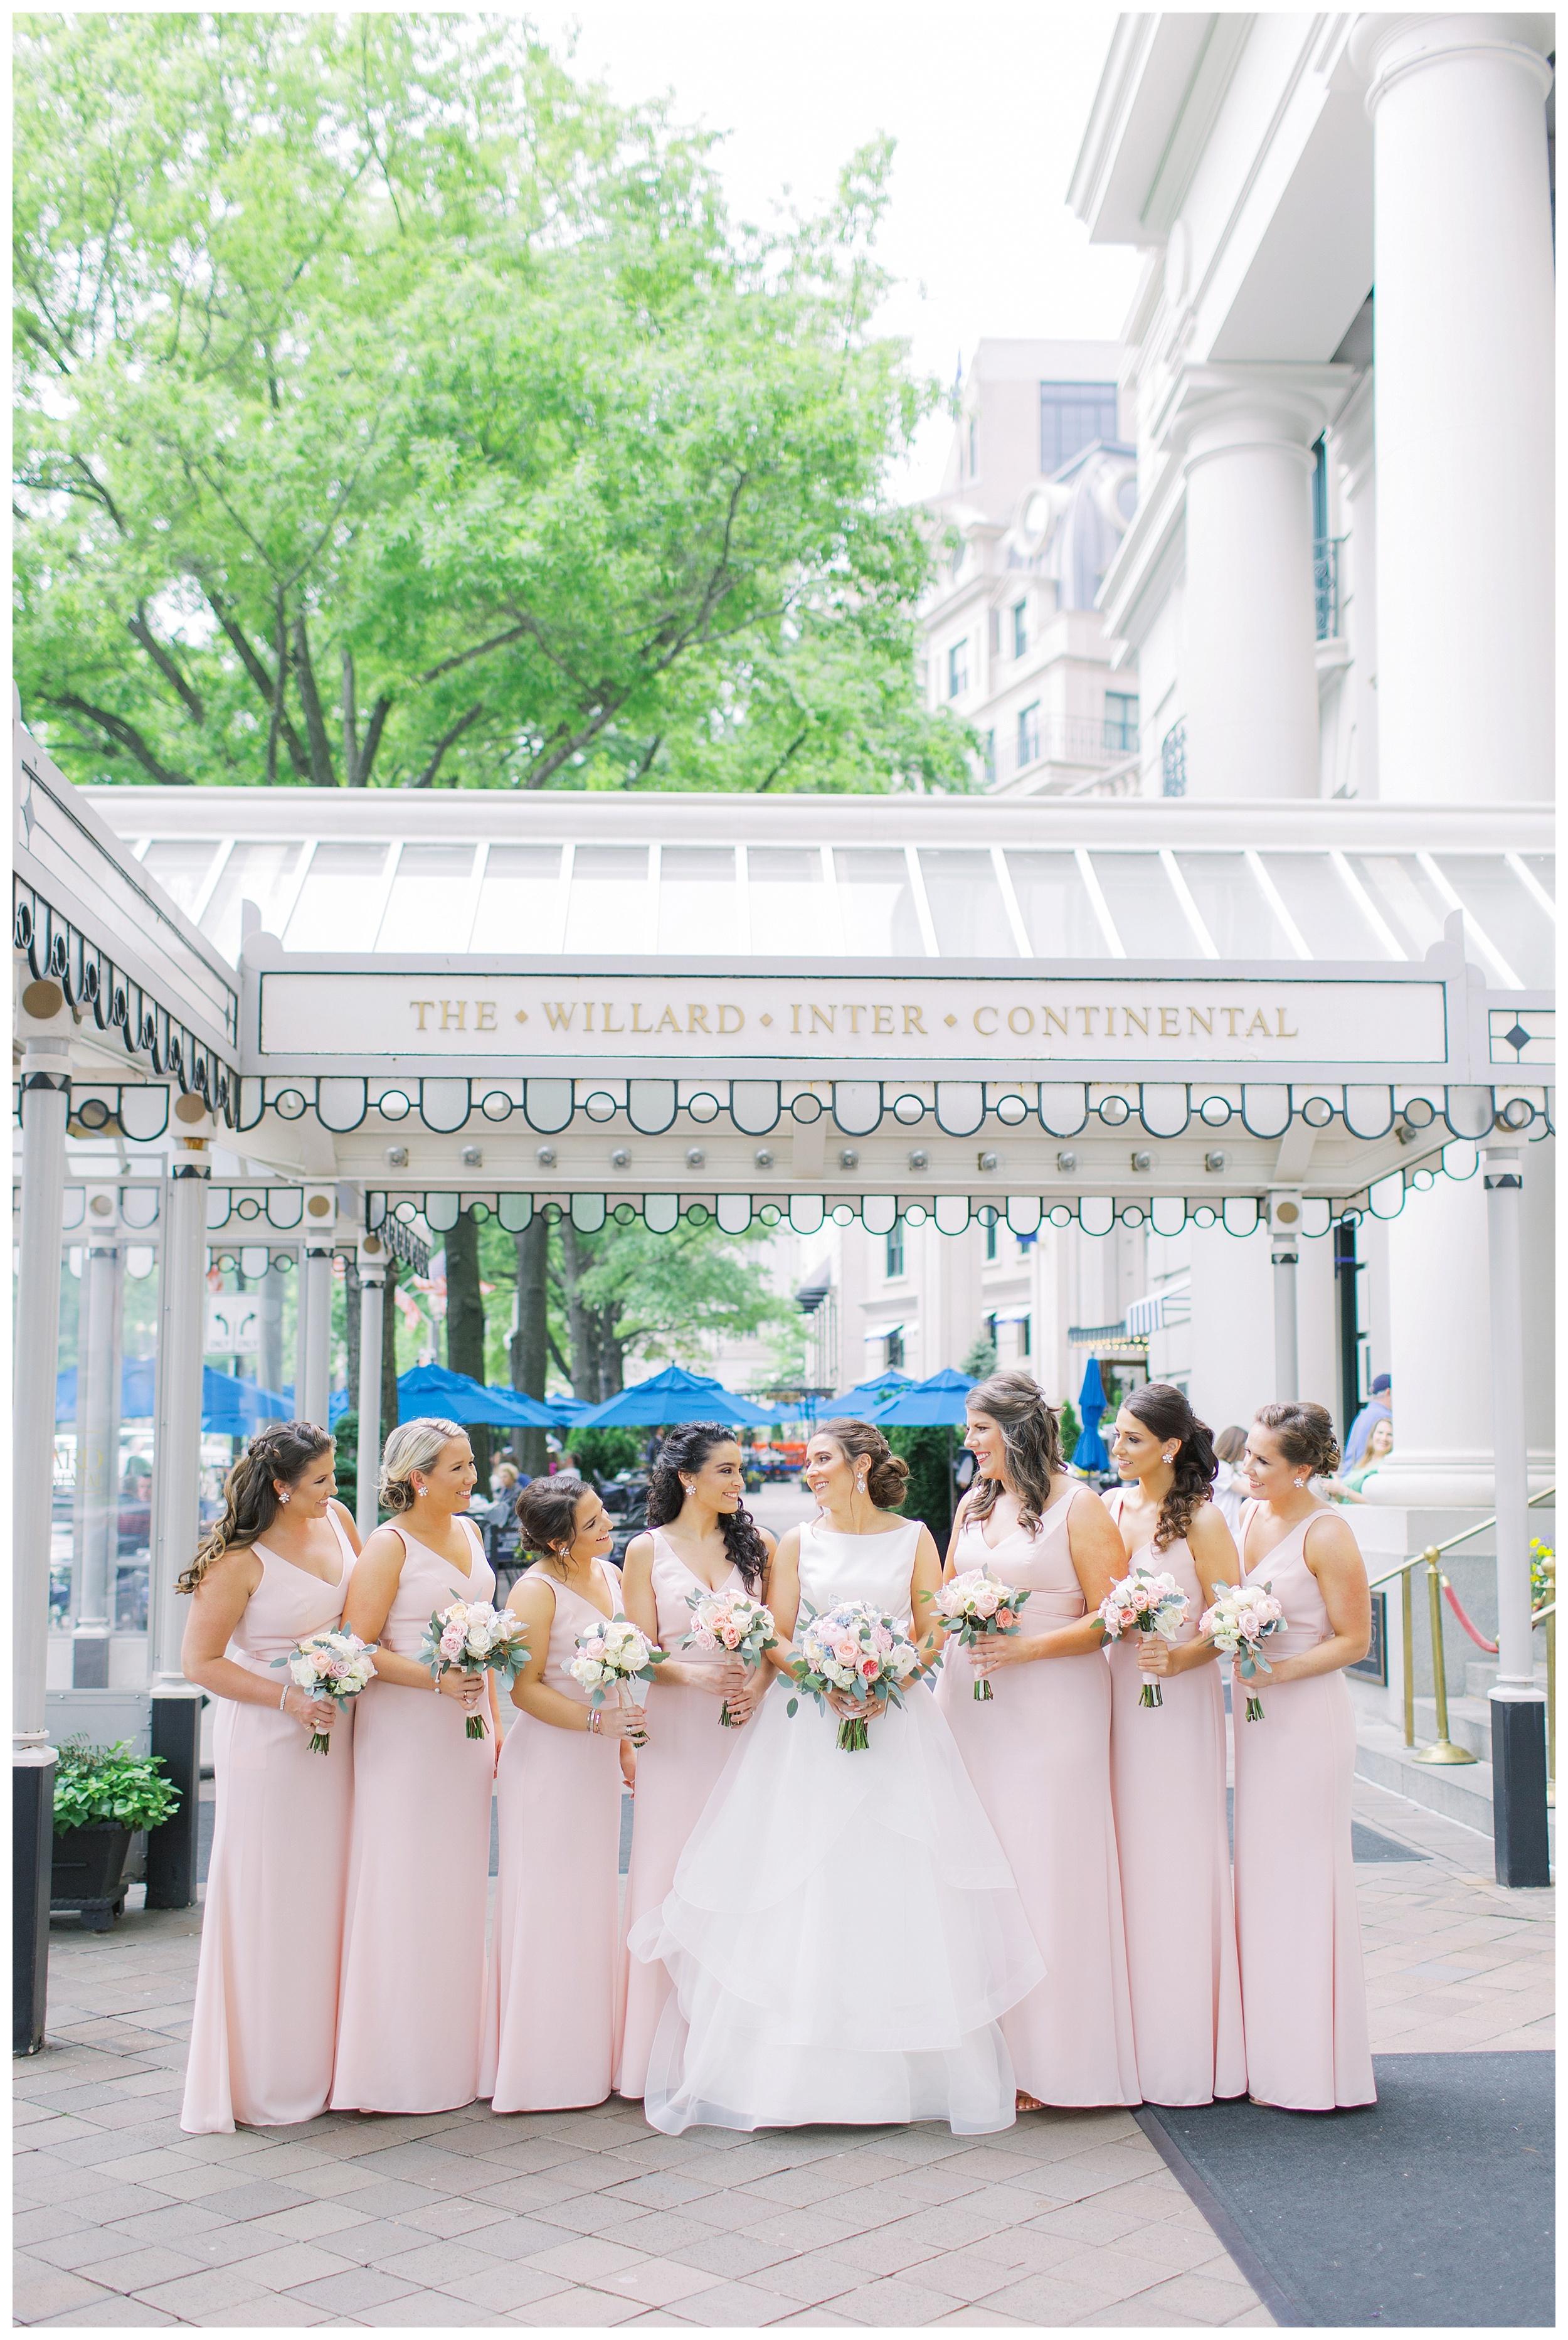 DAR Constitution Hall Wedding Wedding | Daughters of the American Revolution Wedding | District of Columbia Film Wedding Photographer Kir Tuben_0035.jpg